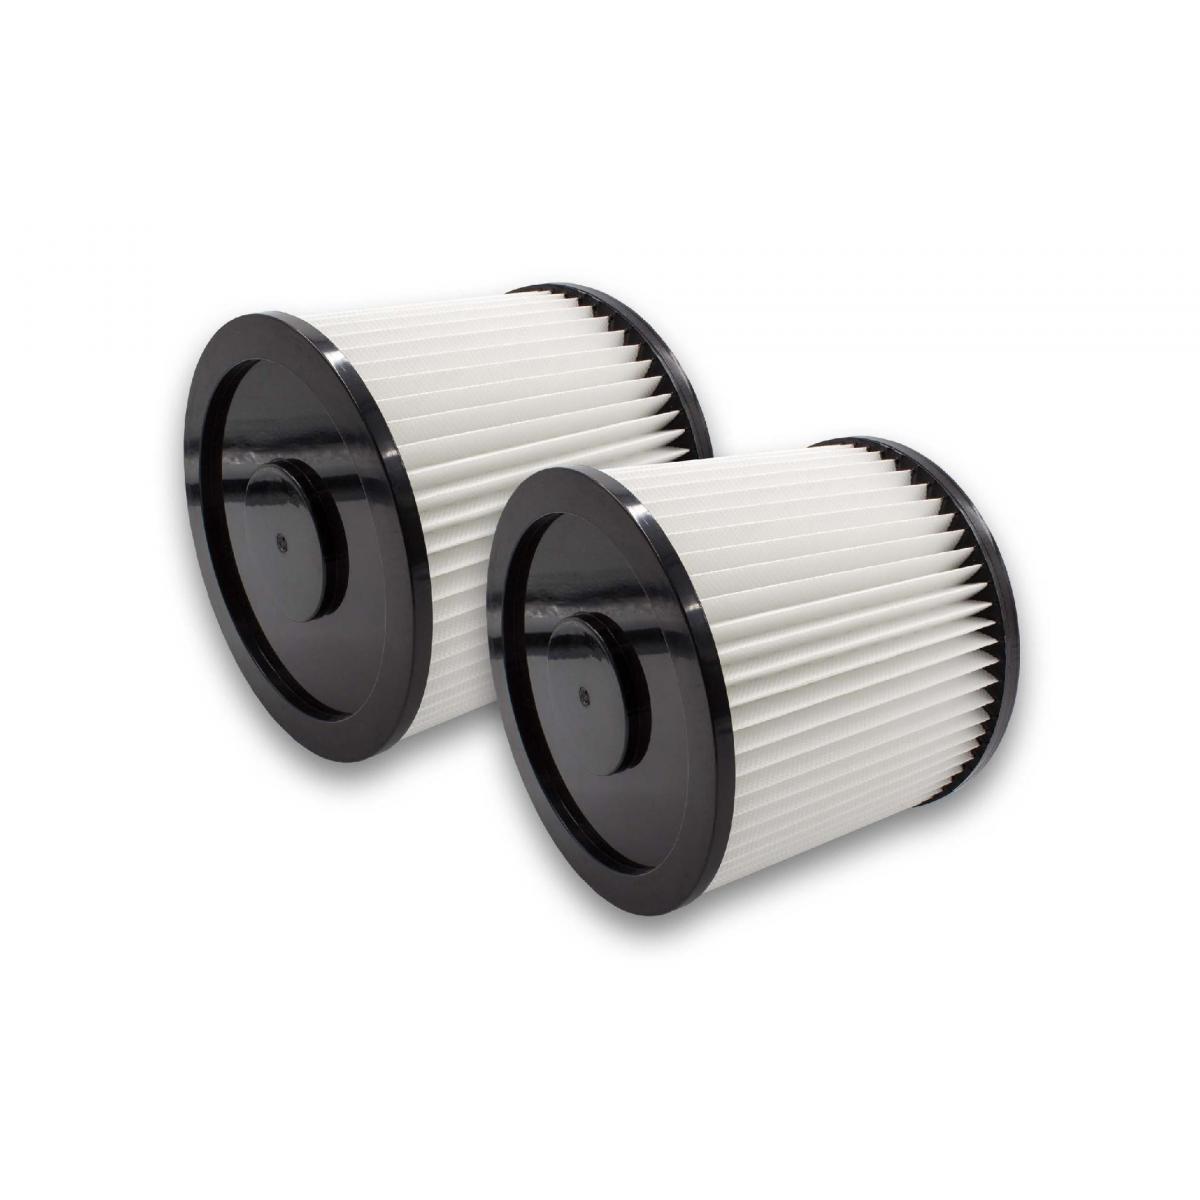 Vhbw vhbw 2x Filtres ronds pour aspirateur Einhell BT-VC 1115, BT-VC 1215 S, BT-VC1250SA, RT-VC 1420, RT-VC 1500, RT-VC 1525